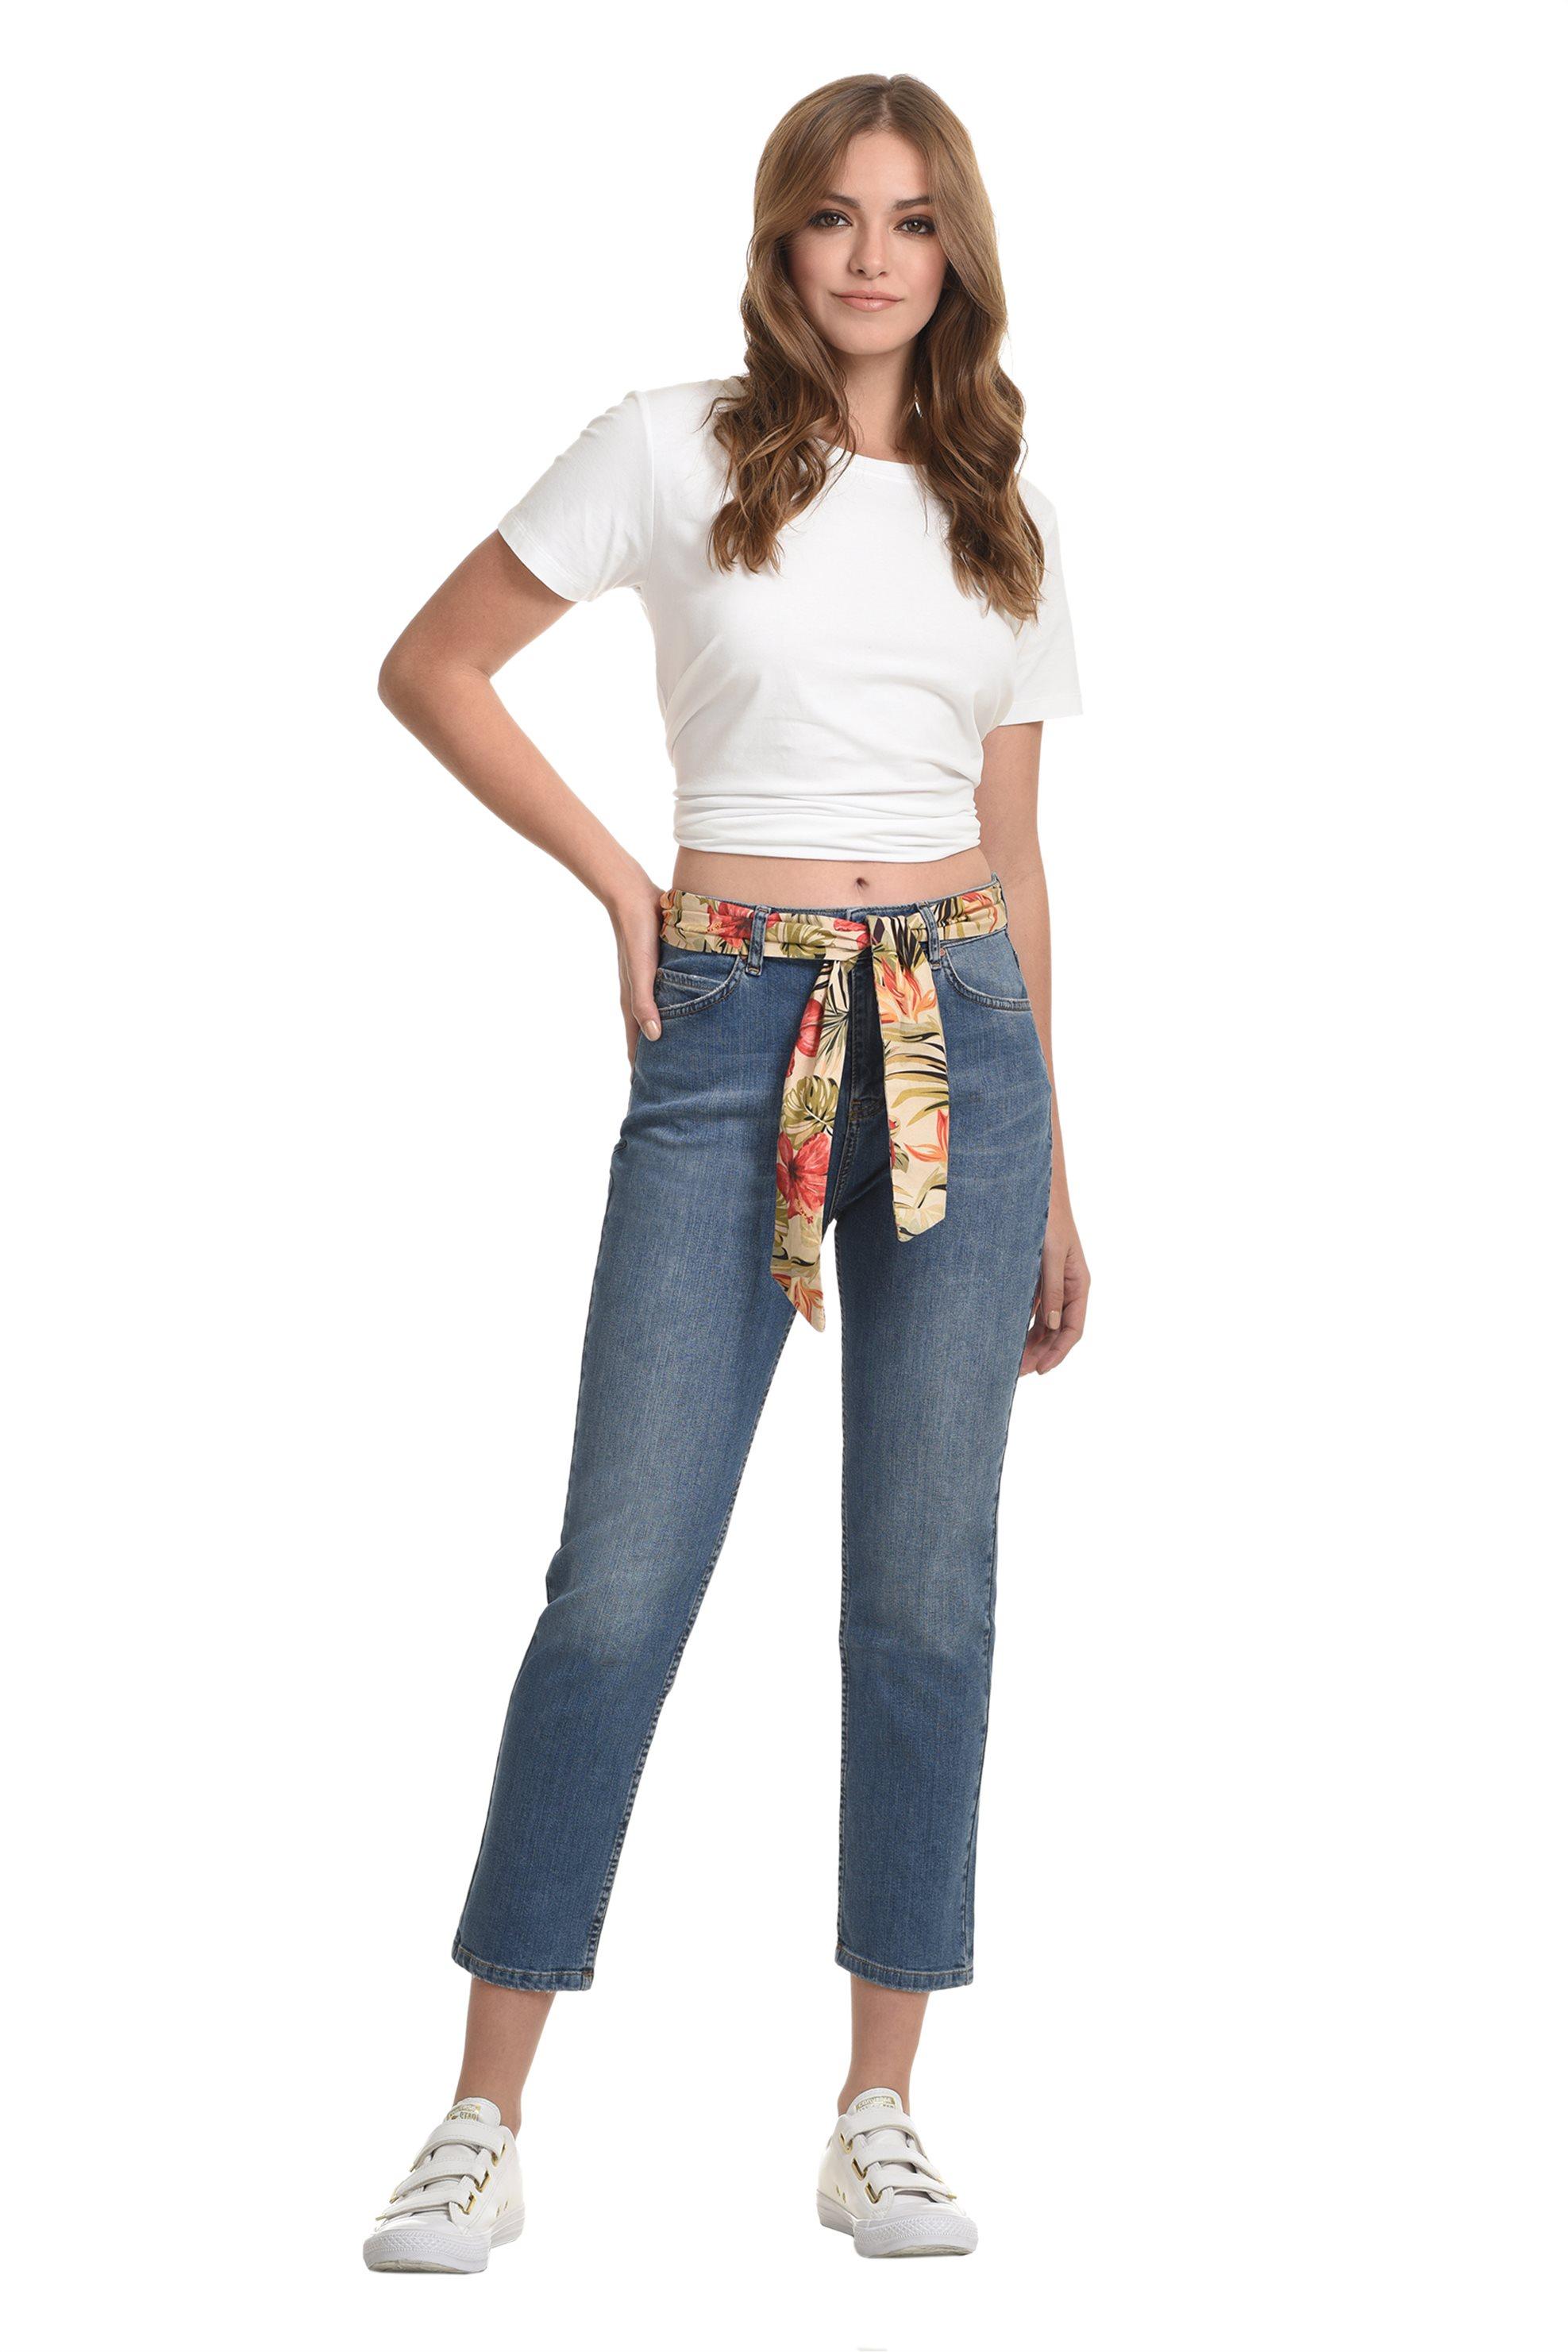 Sarah Lawrence Jeans γυναικείο τζην παντελόνι boyfriend - 2-900022 - Μπλε γυναικα   ρουχα   jeans   boyfriend